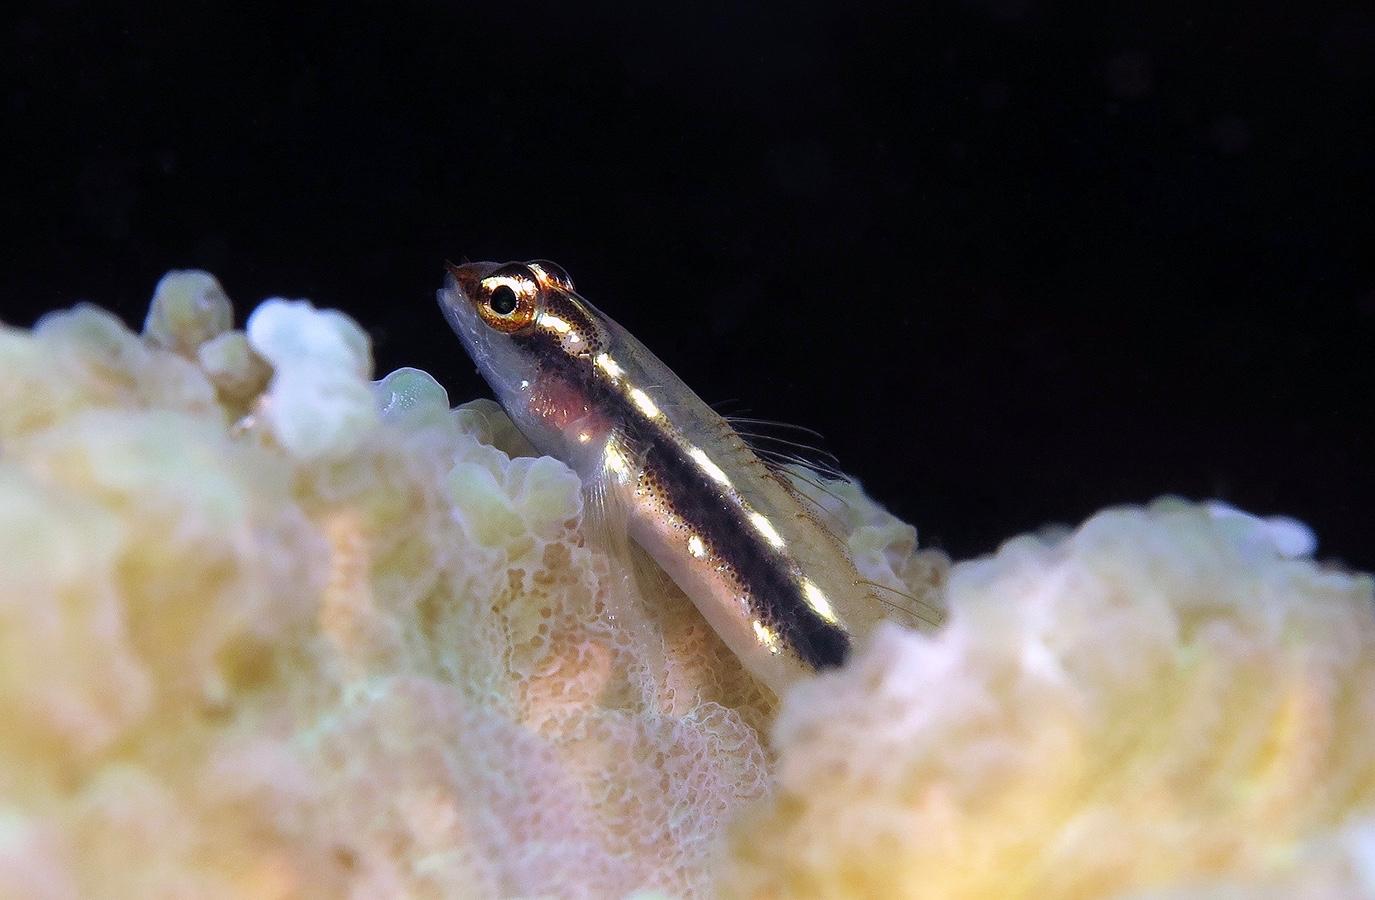 Eviota sebreei     巴厘岛艾湄湾 Amed Bay 印度尼西亚 Indonesia @lazydiving.com 潜水时光